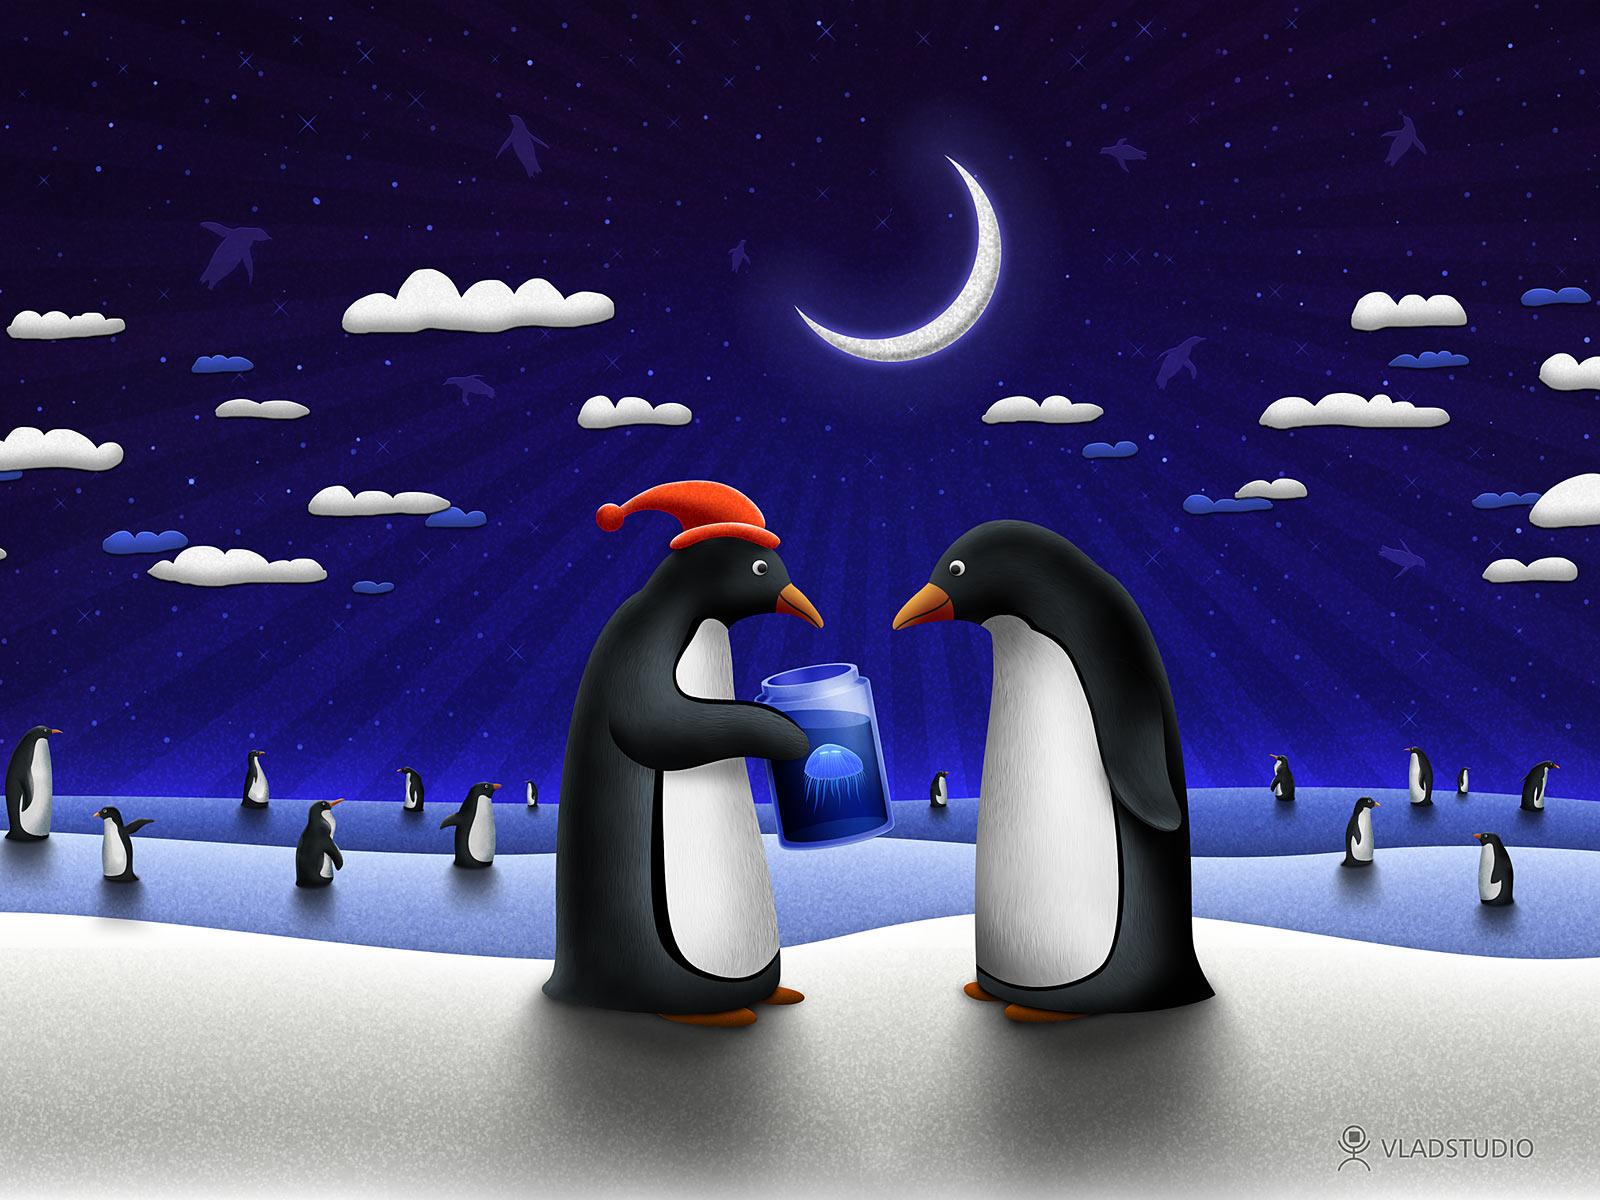 http://3.bp.blogspot.com/_5KSanhHpTHY/TQJ9a4INYVI/AAAAAAAADWs/DGmUz8CNZL0/s1600/A_Small_Gift_For_Christmas_by_vladstudio.jpg